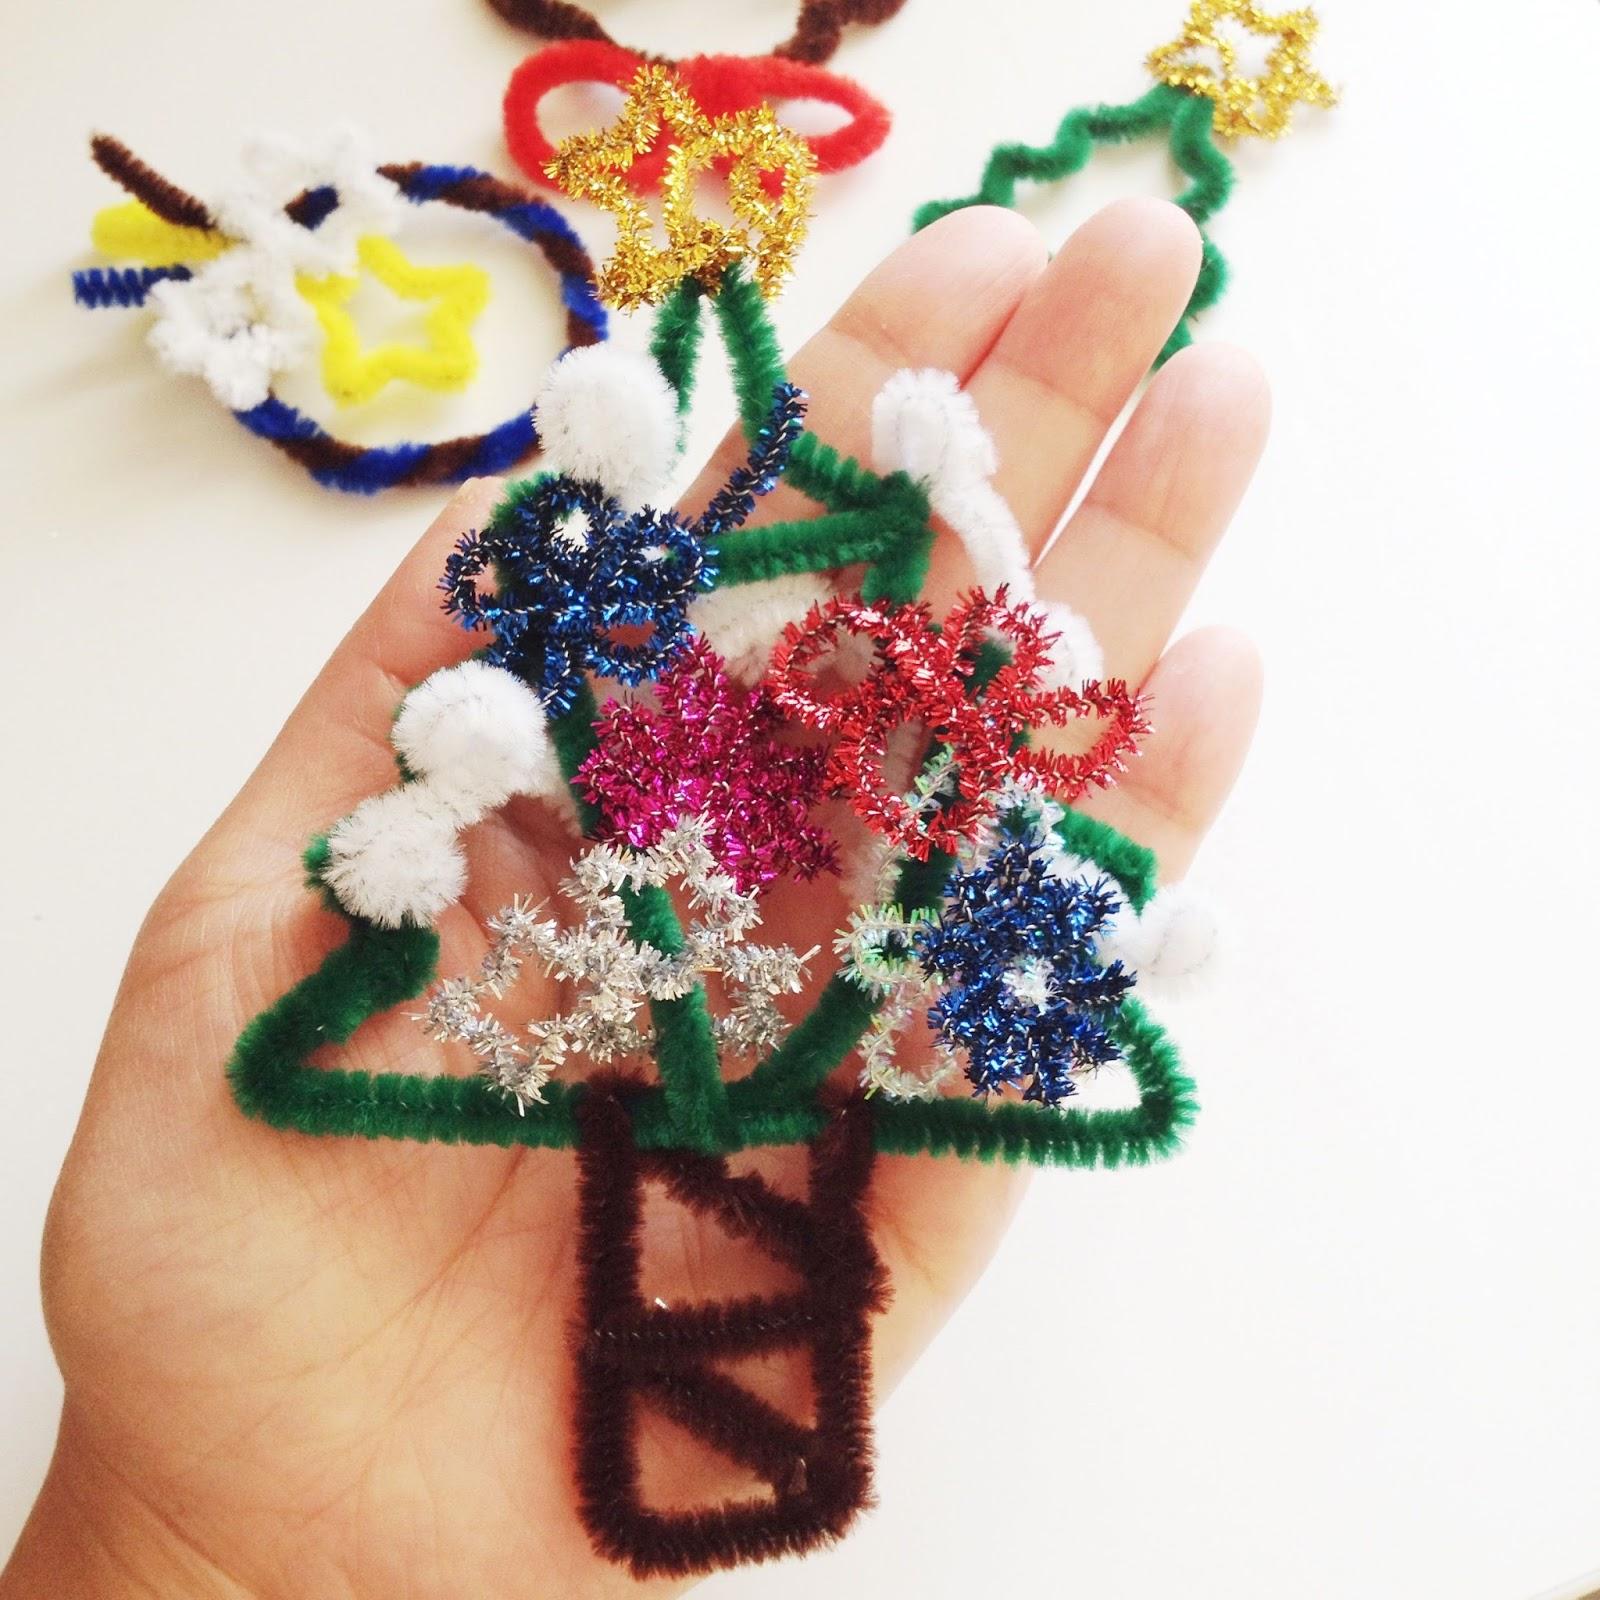 Yukamila art pipe cleaner crafts christmas ornaments 2013 for Pipe cleaner christmas crafts